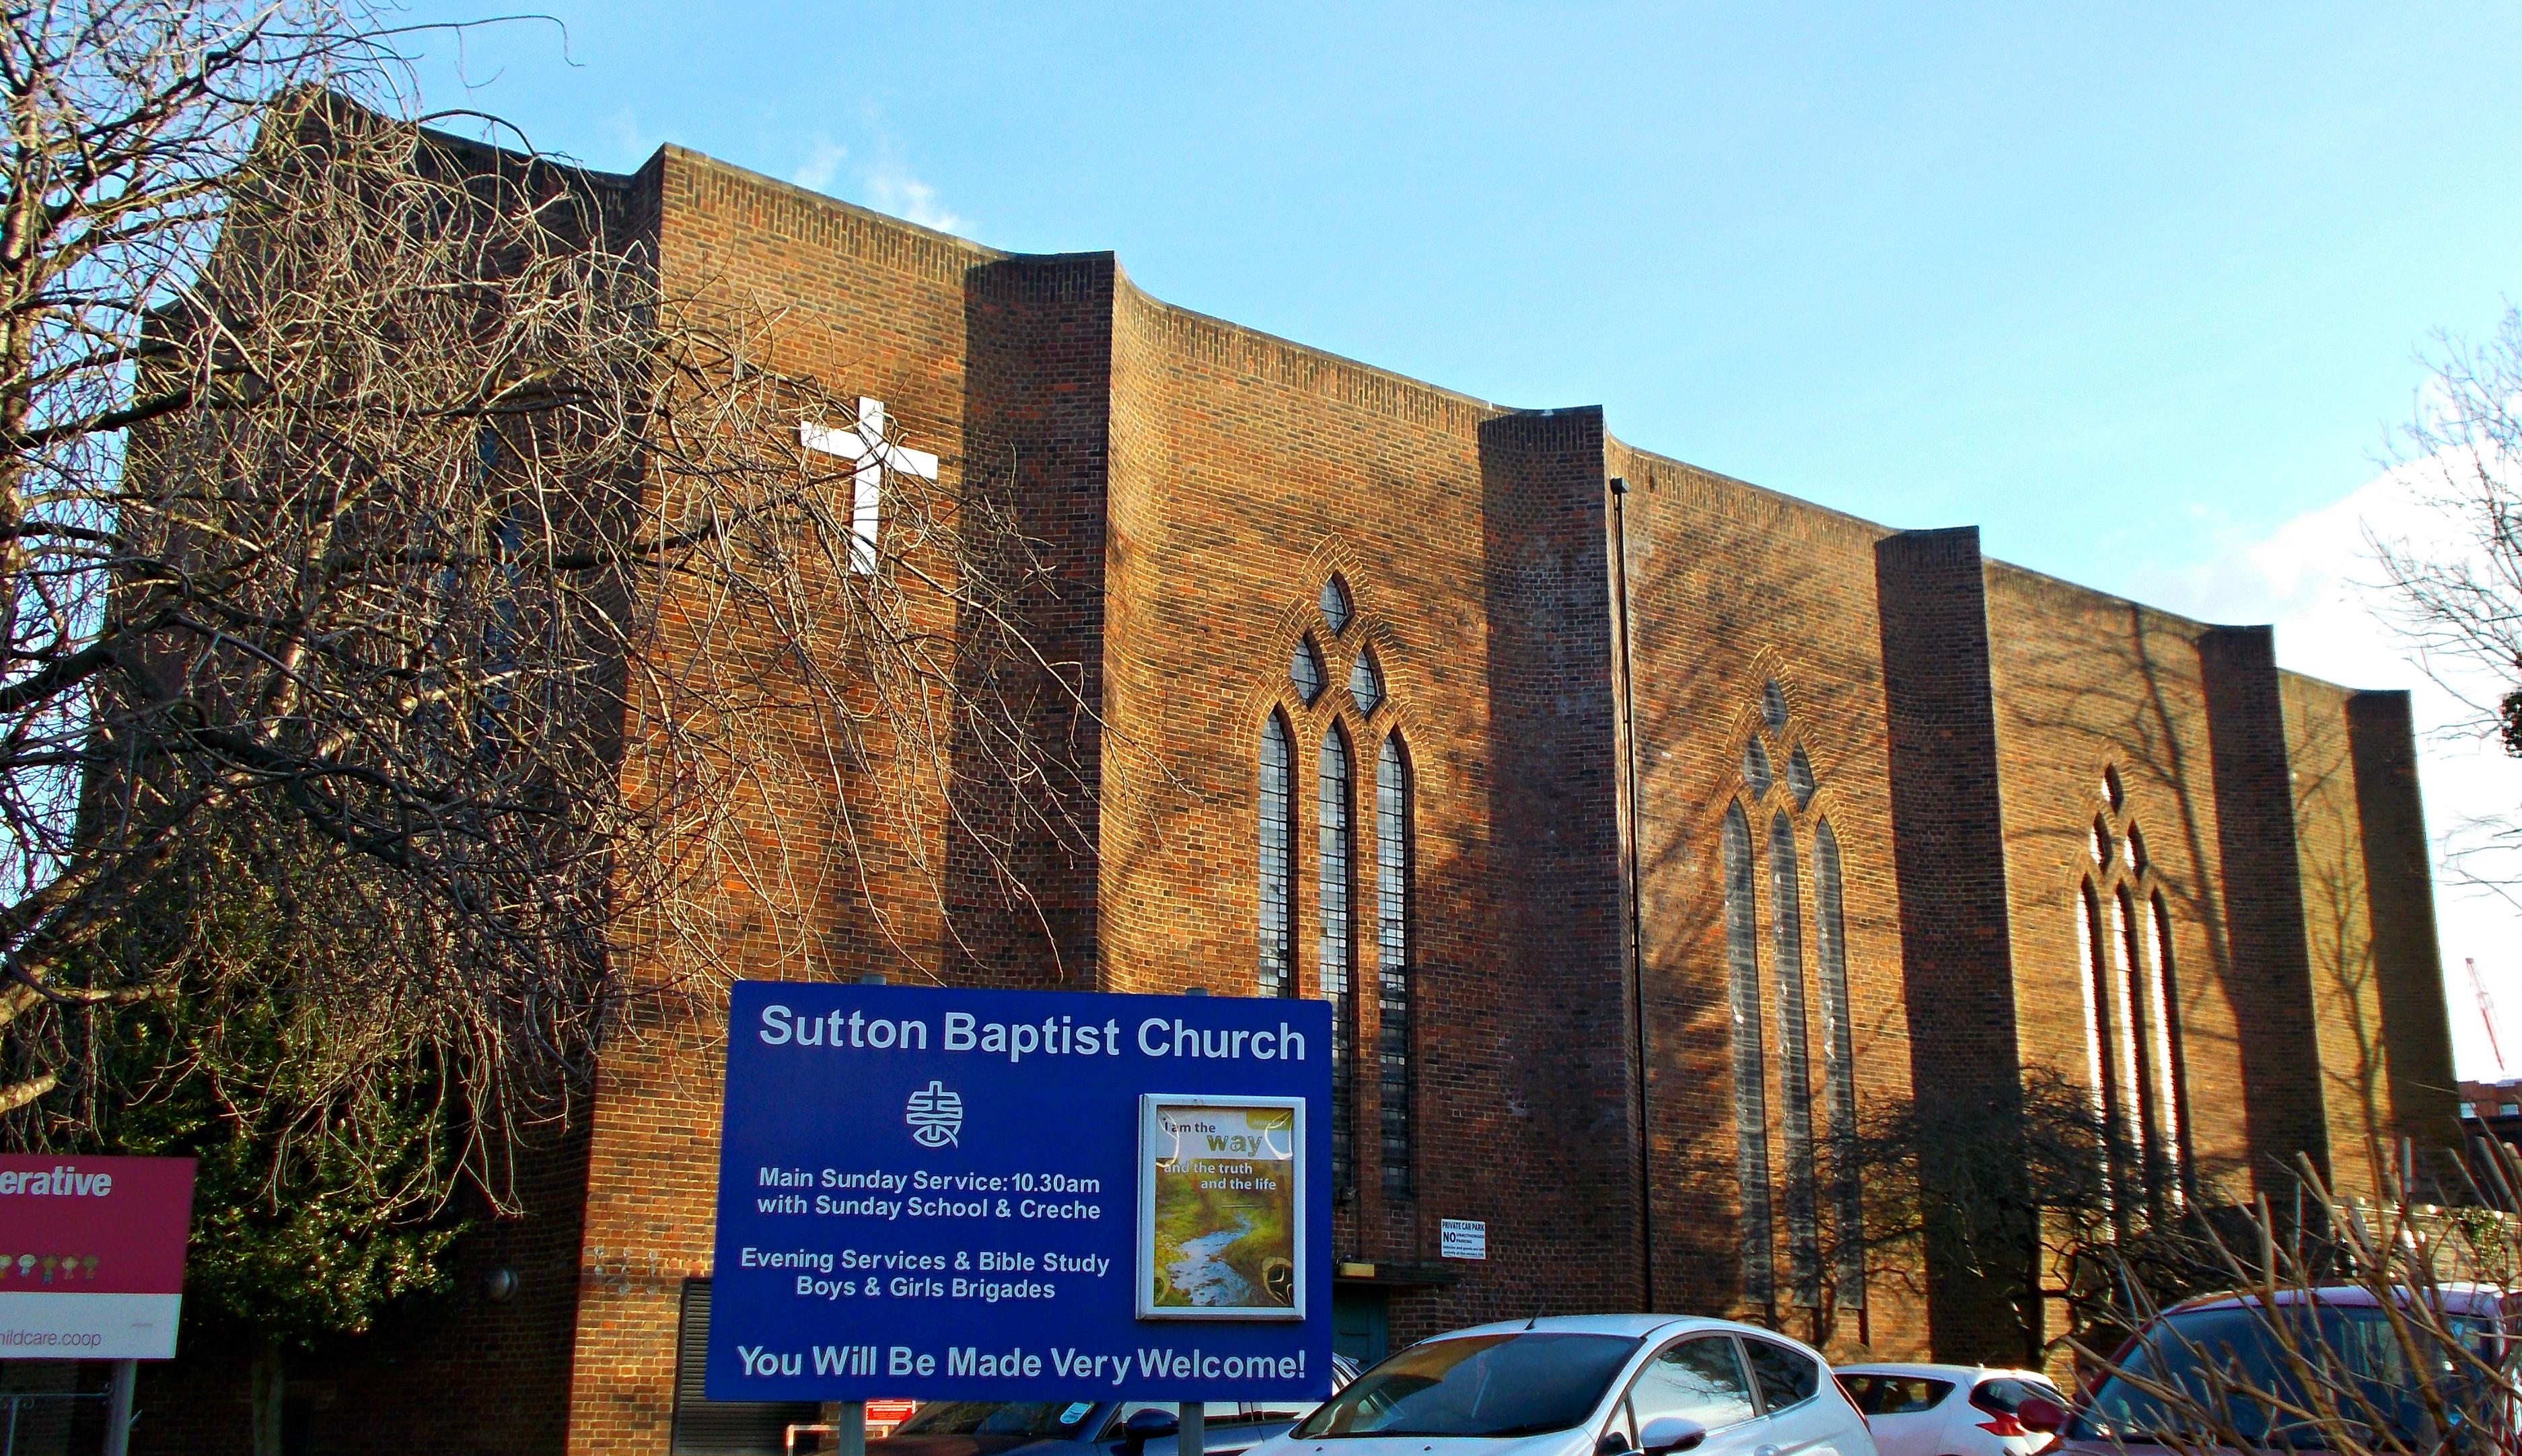 File:Sutton Baptist Church, SUTTON, Surrey, Greater London